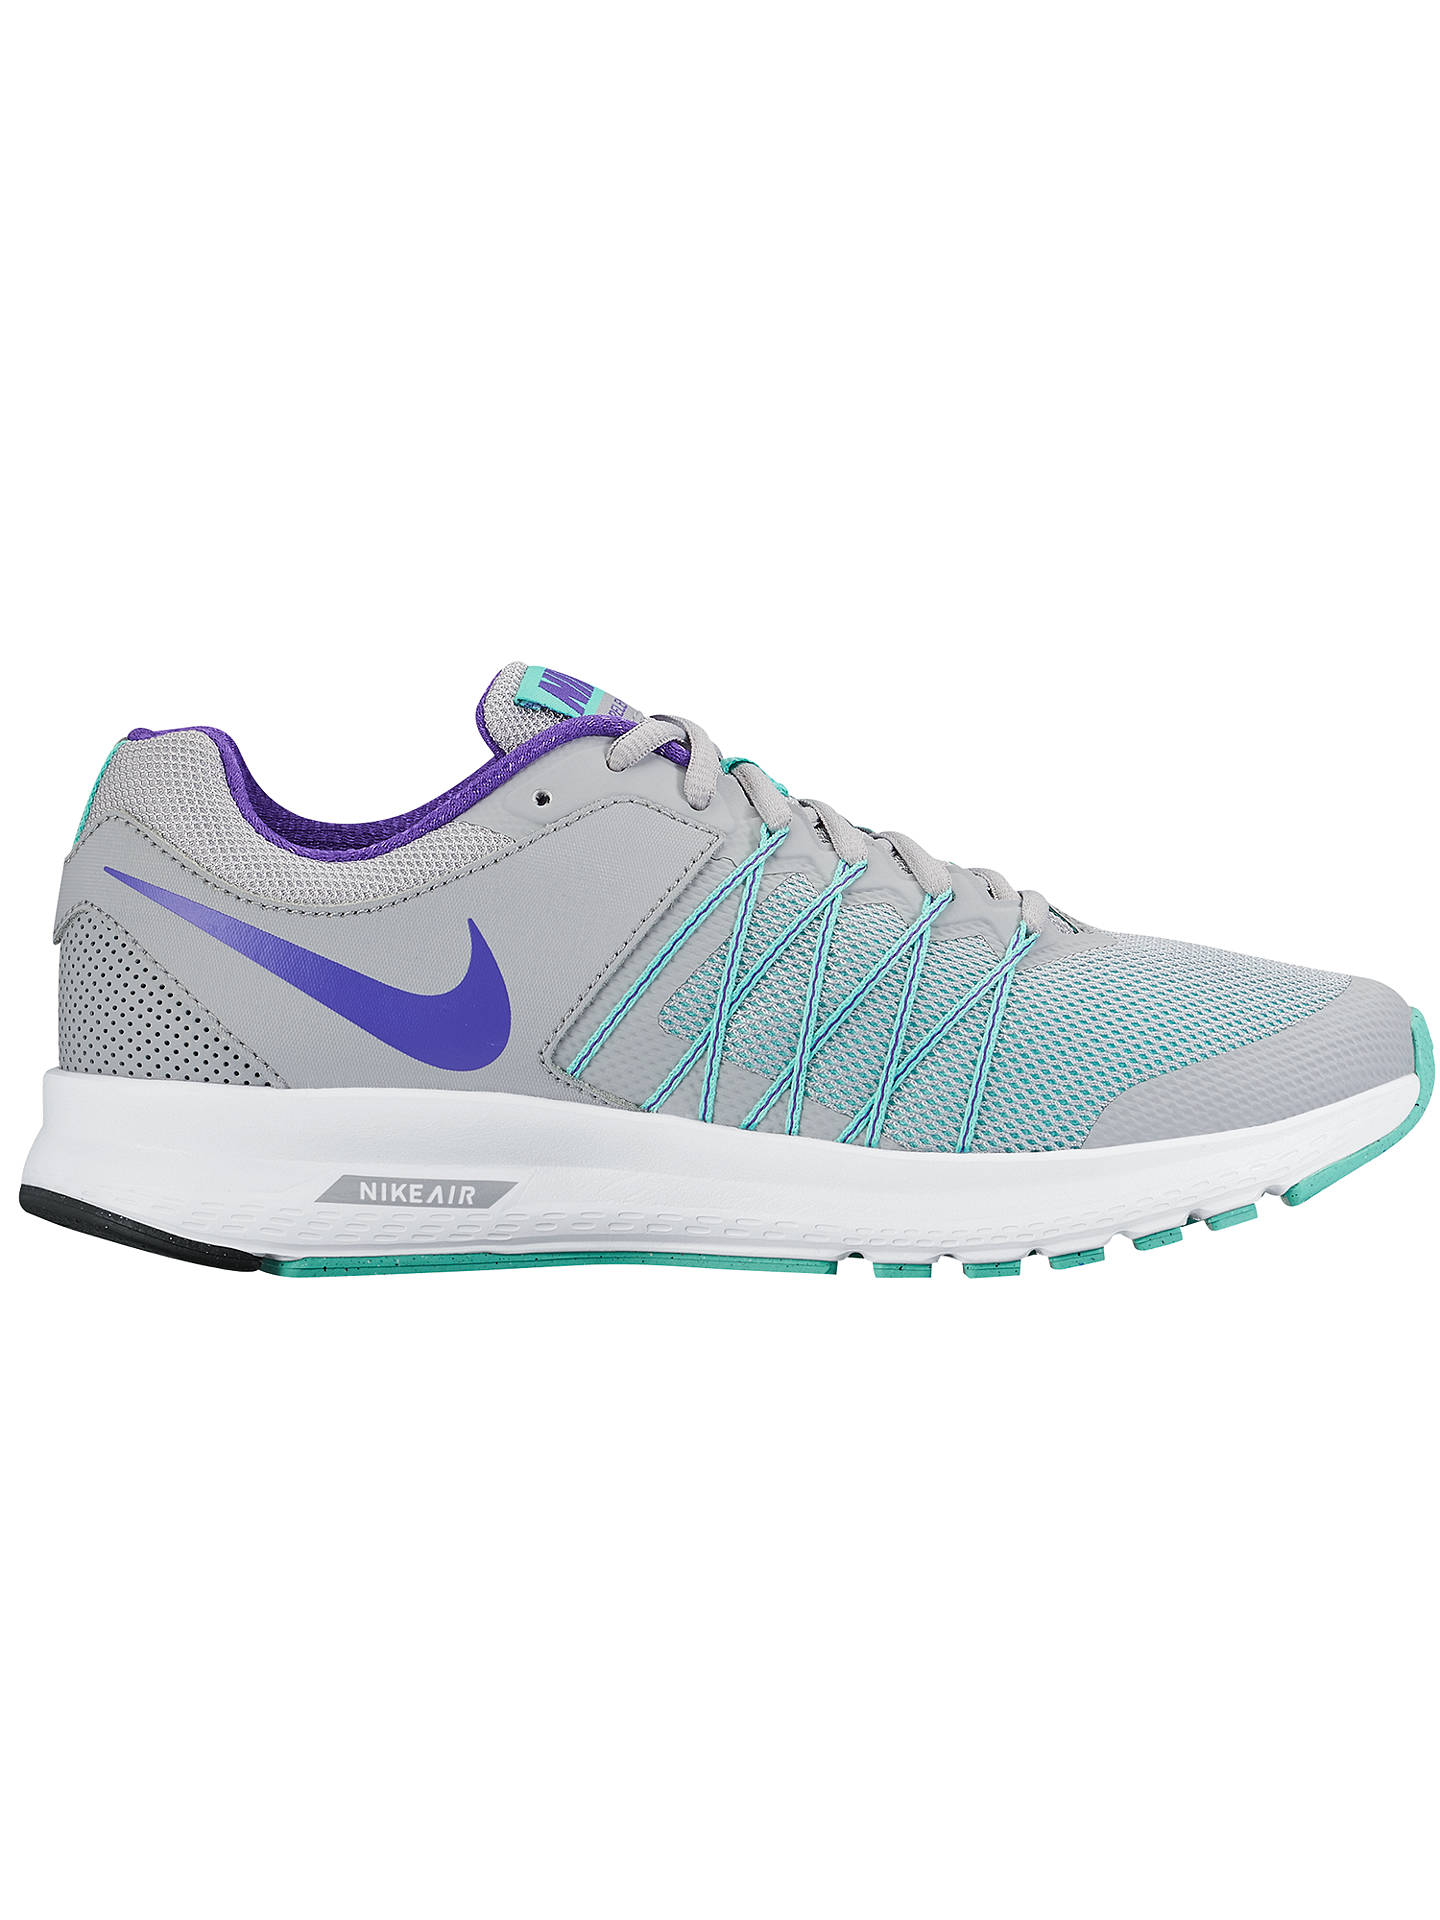 4a416baf8f93 Nike Air Relentless 6 Women s Running Shoes at John Lewis   Partners